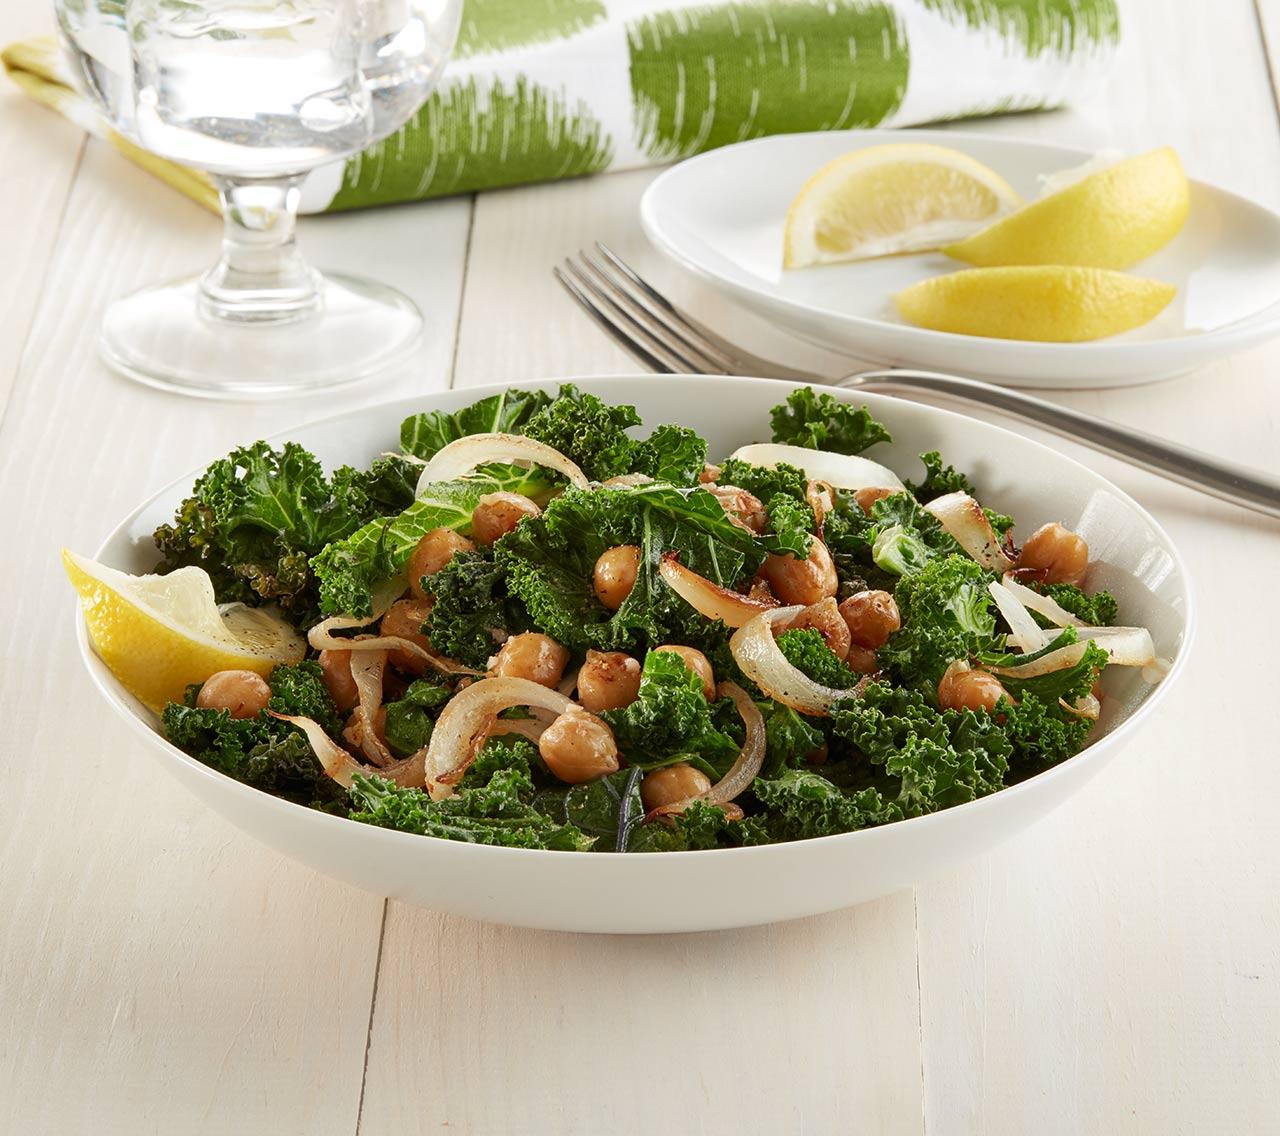 Vegan Kale and Chickpea Saute